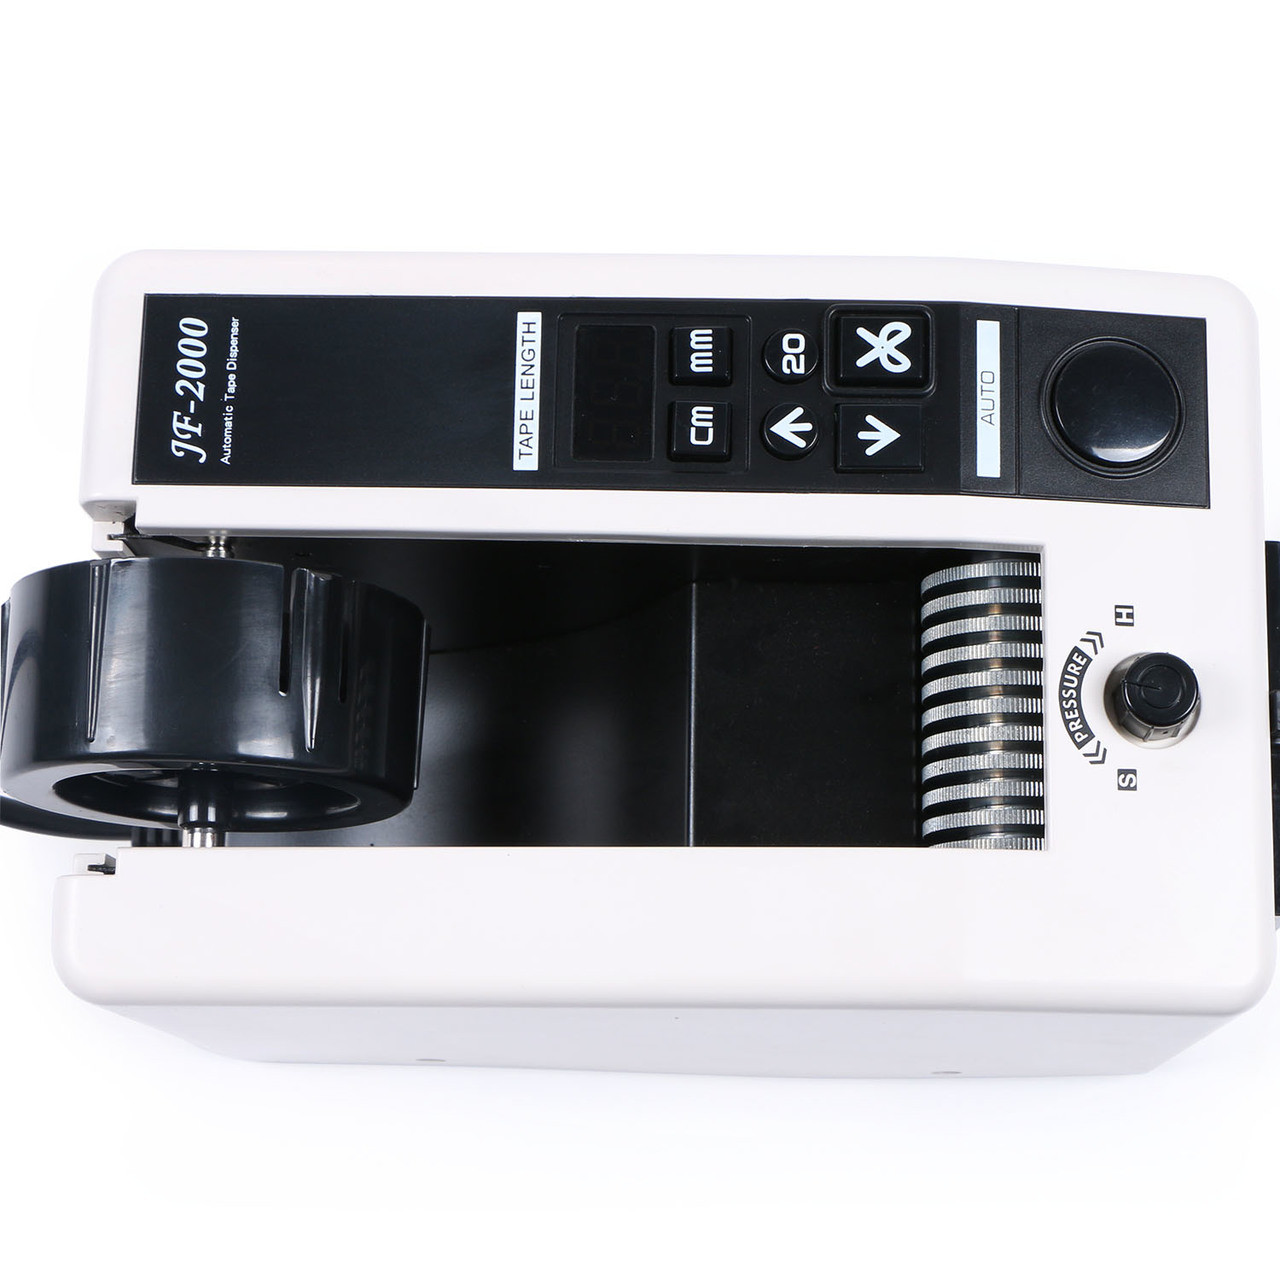 U.S. Solid Automatic Tape Cutter and Dispenser Machine, JF-2000